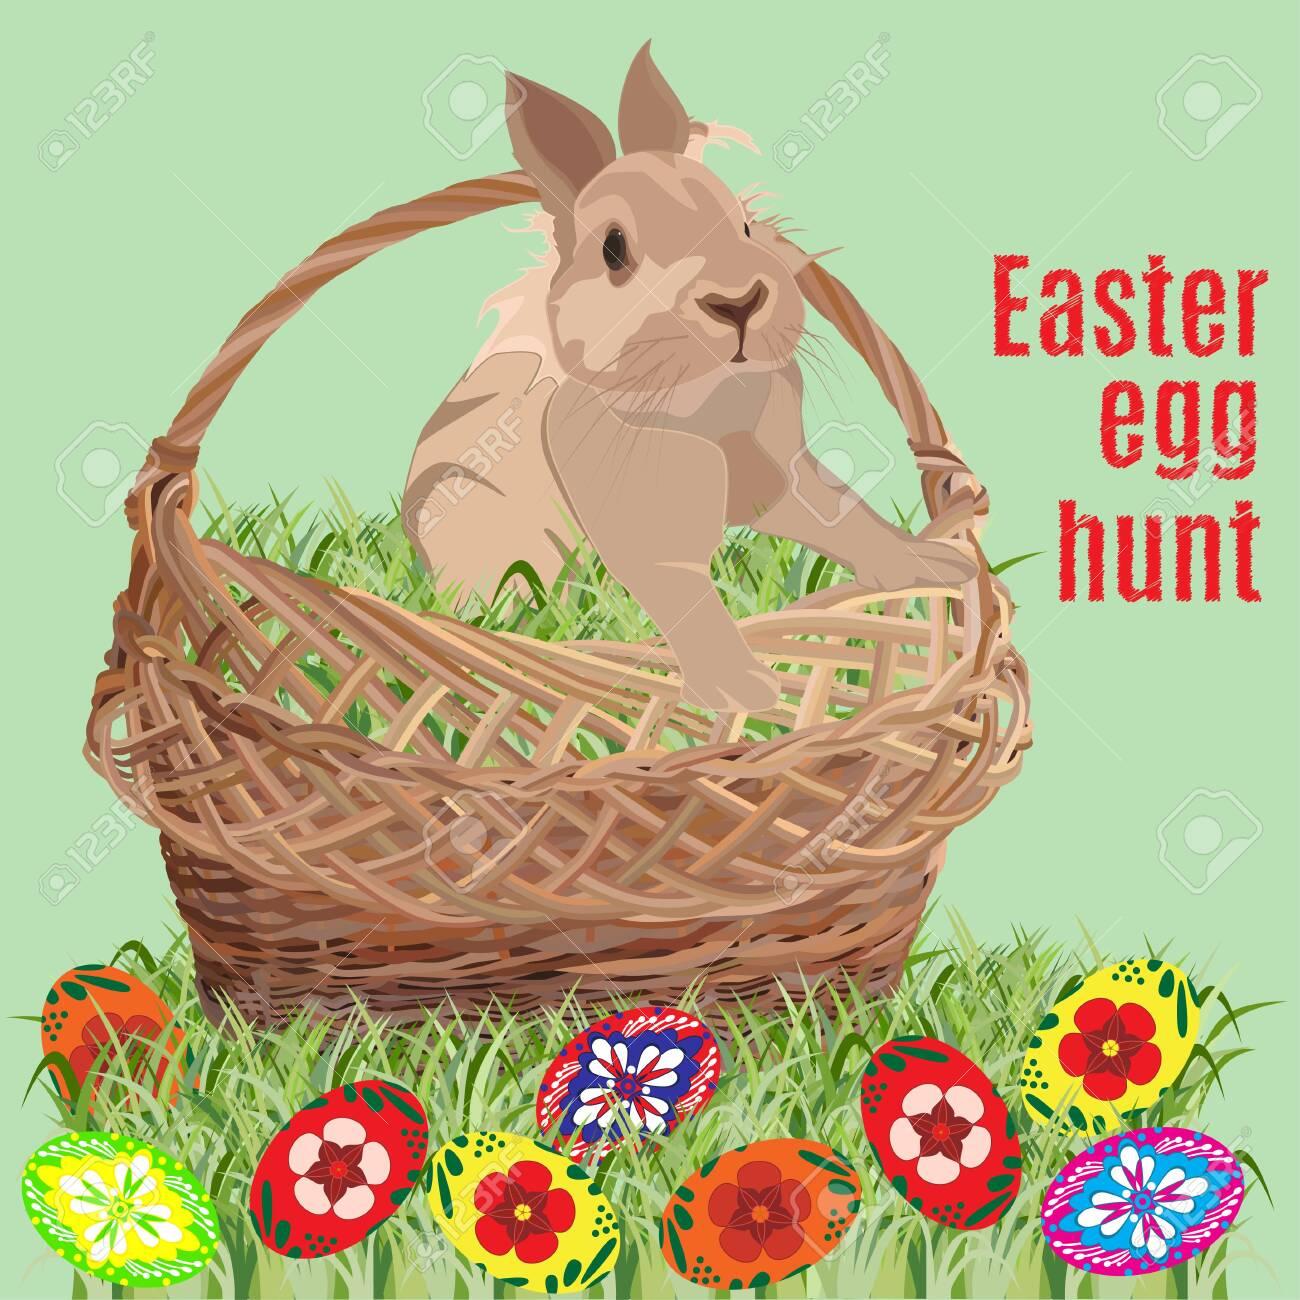 Easter egg hunt poster banner template, vector illustration - 124430700